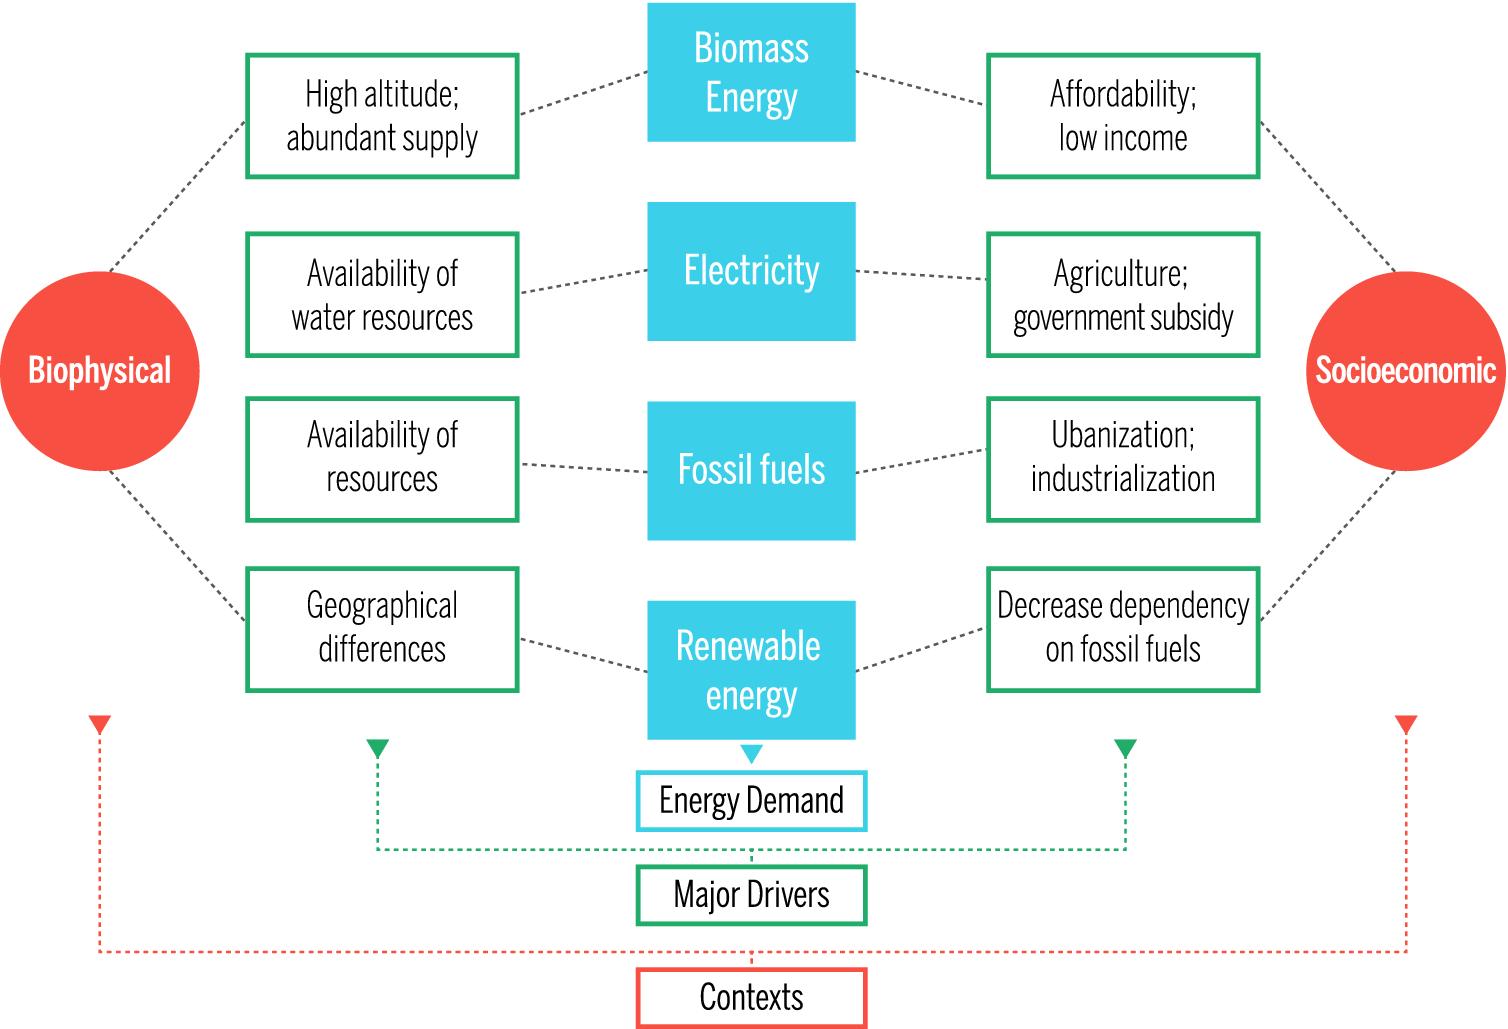 Meeting Future Energy Needs in the Hindu Kush Himalaya | SpringerLink